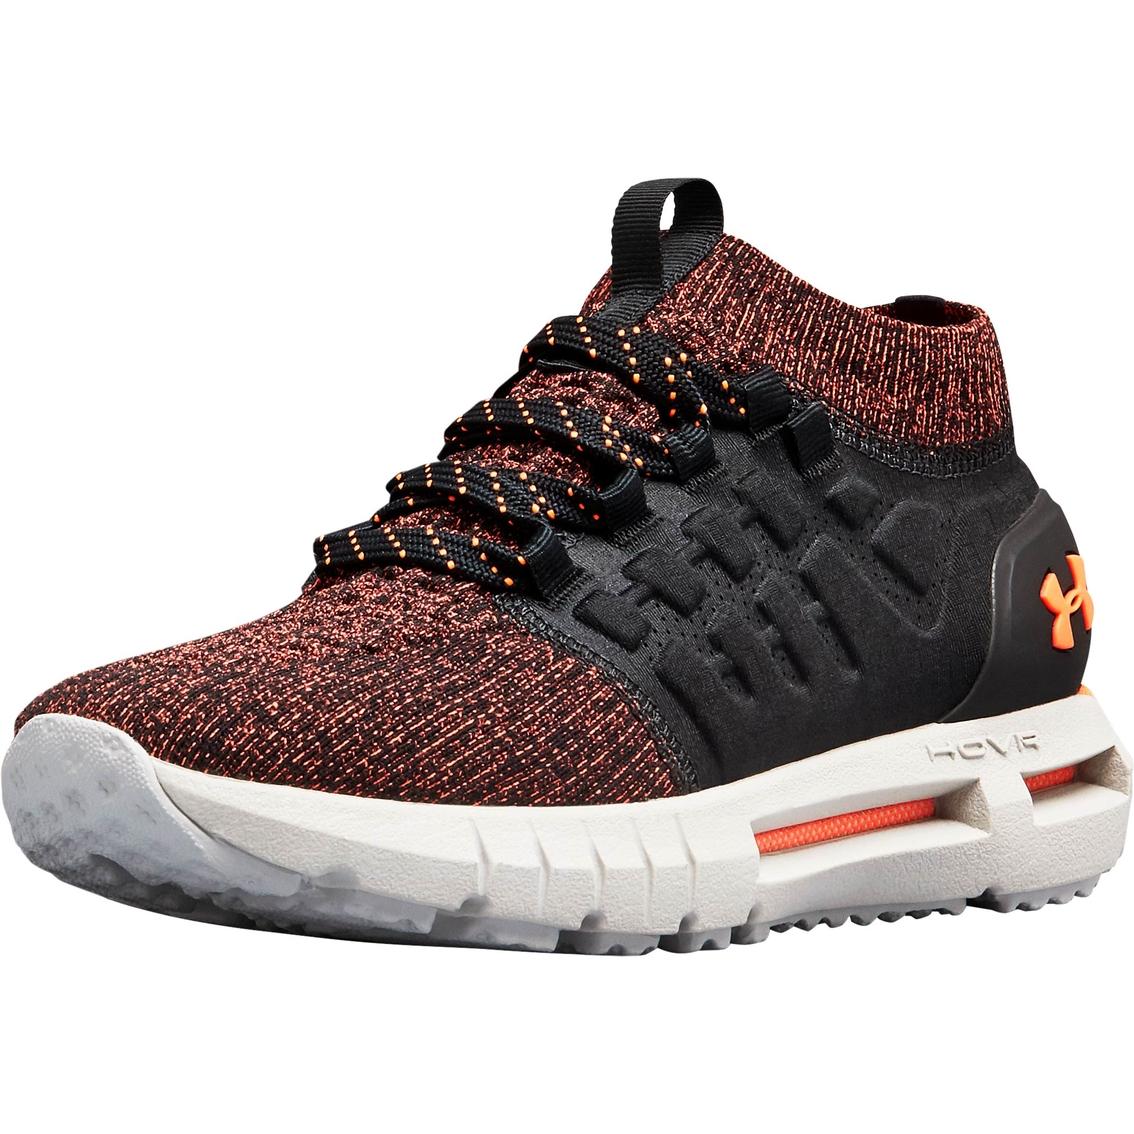 huge selection of 3a54d 472a6 Under Armour Women's Ua Hovr Phantom Running Shoes | Running ...